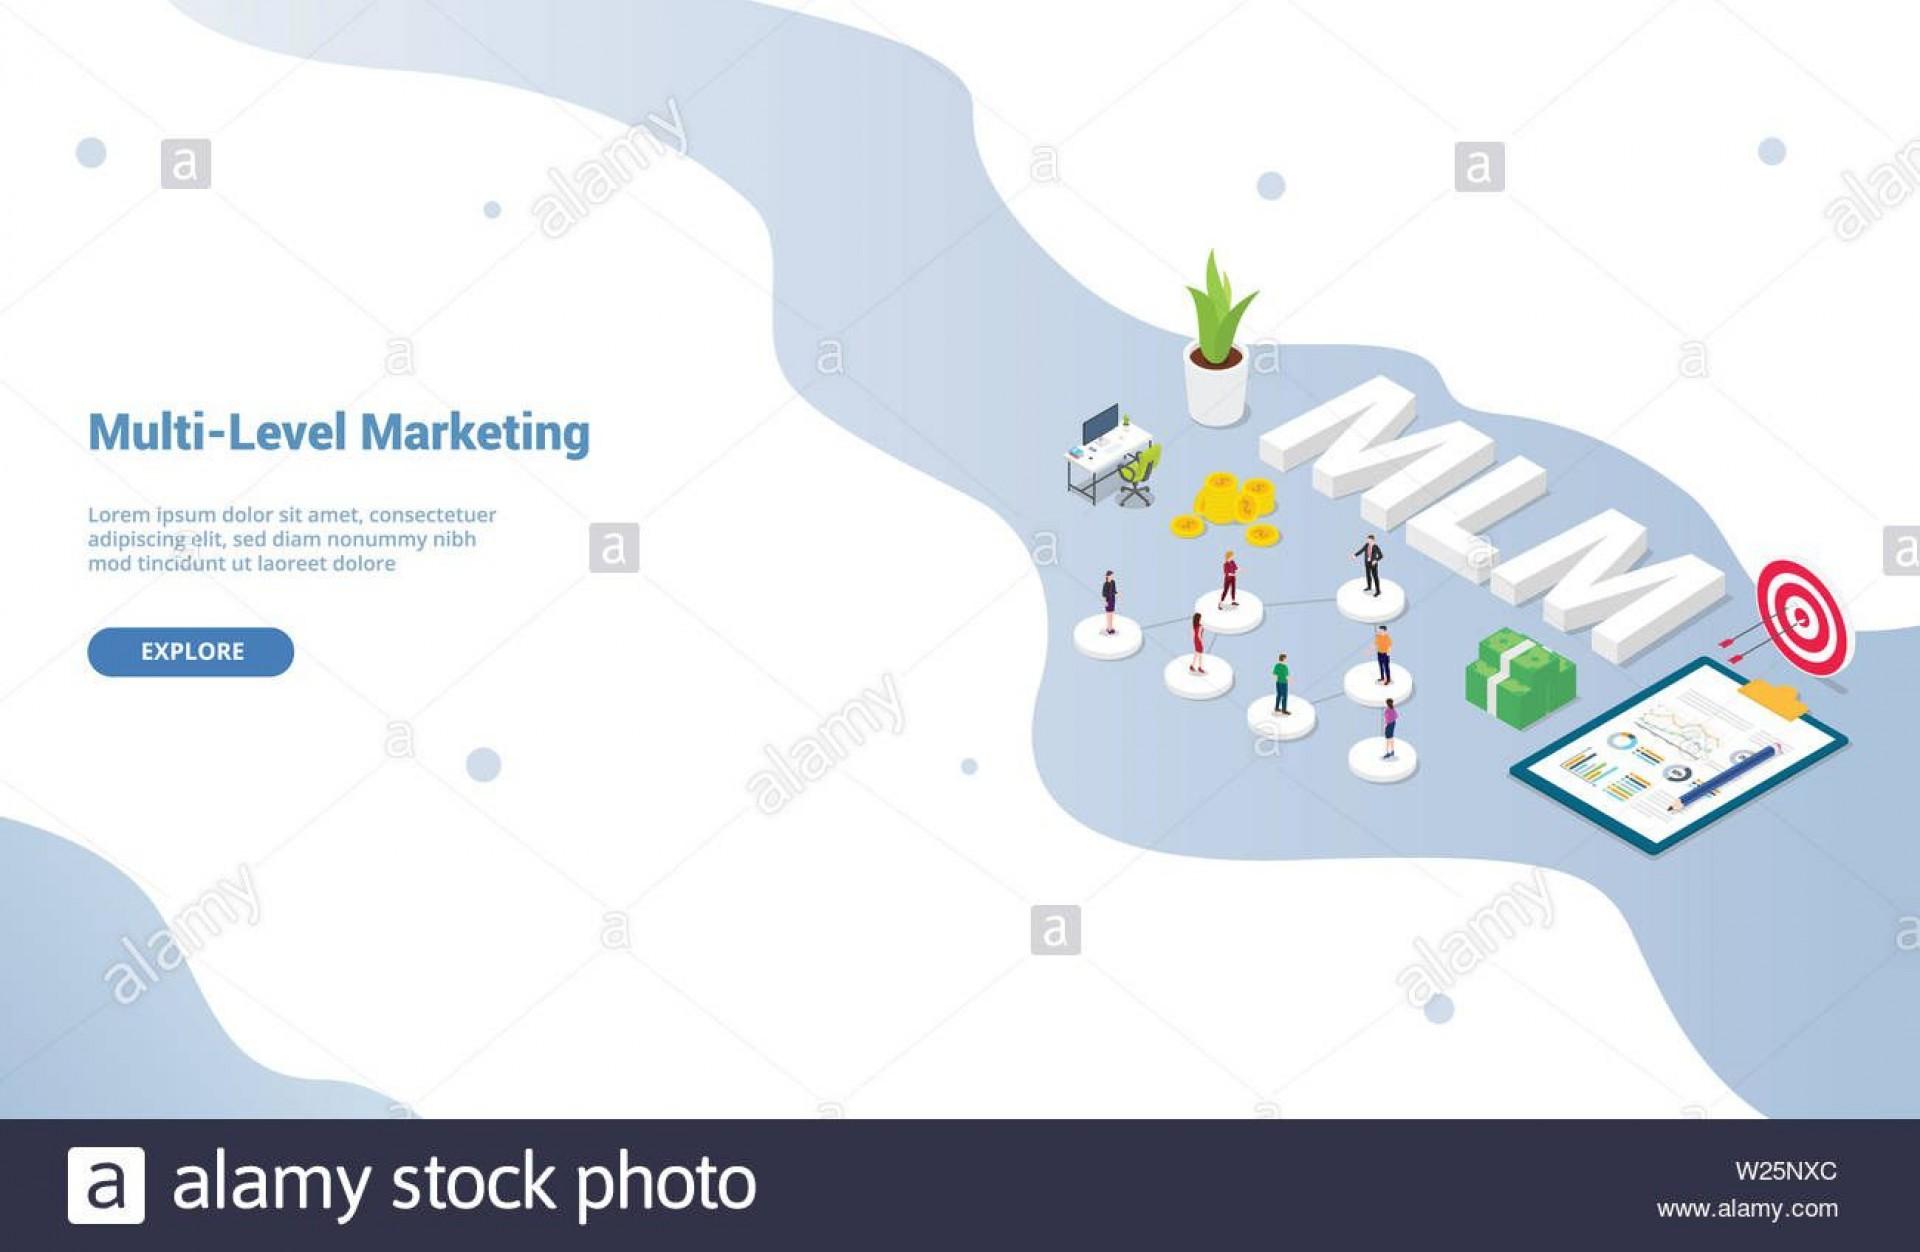 008 Top Multi Level Marketing Busines Plan Template Image  Network Pdf1920